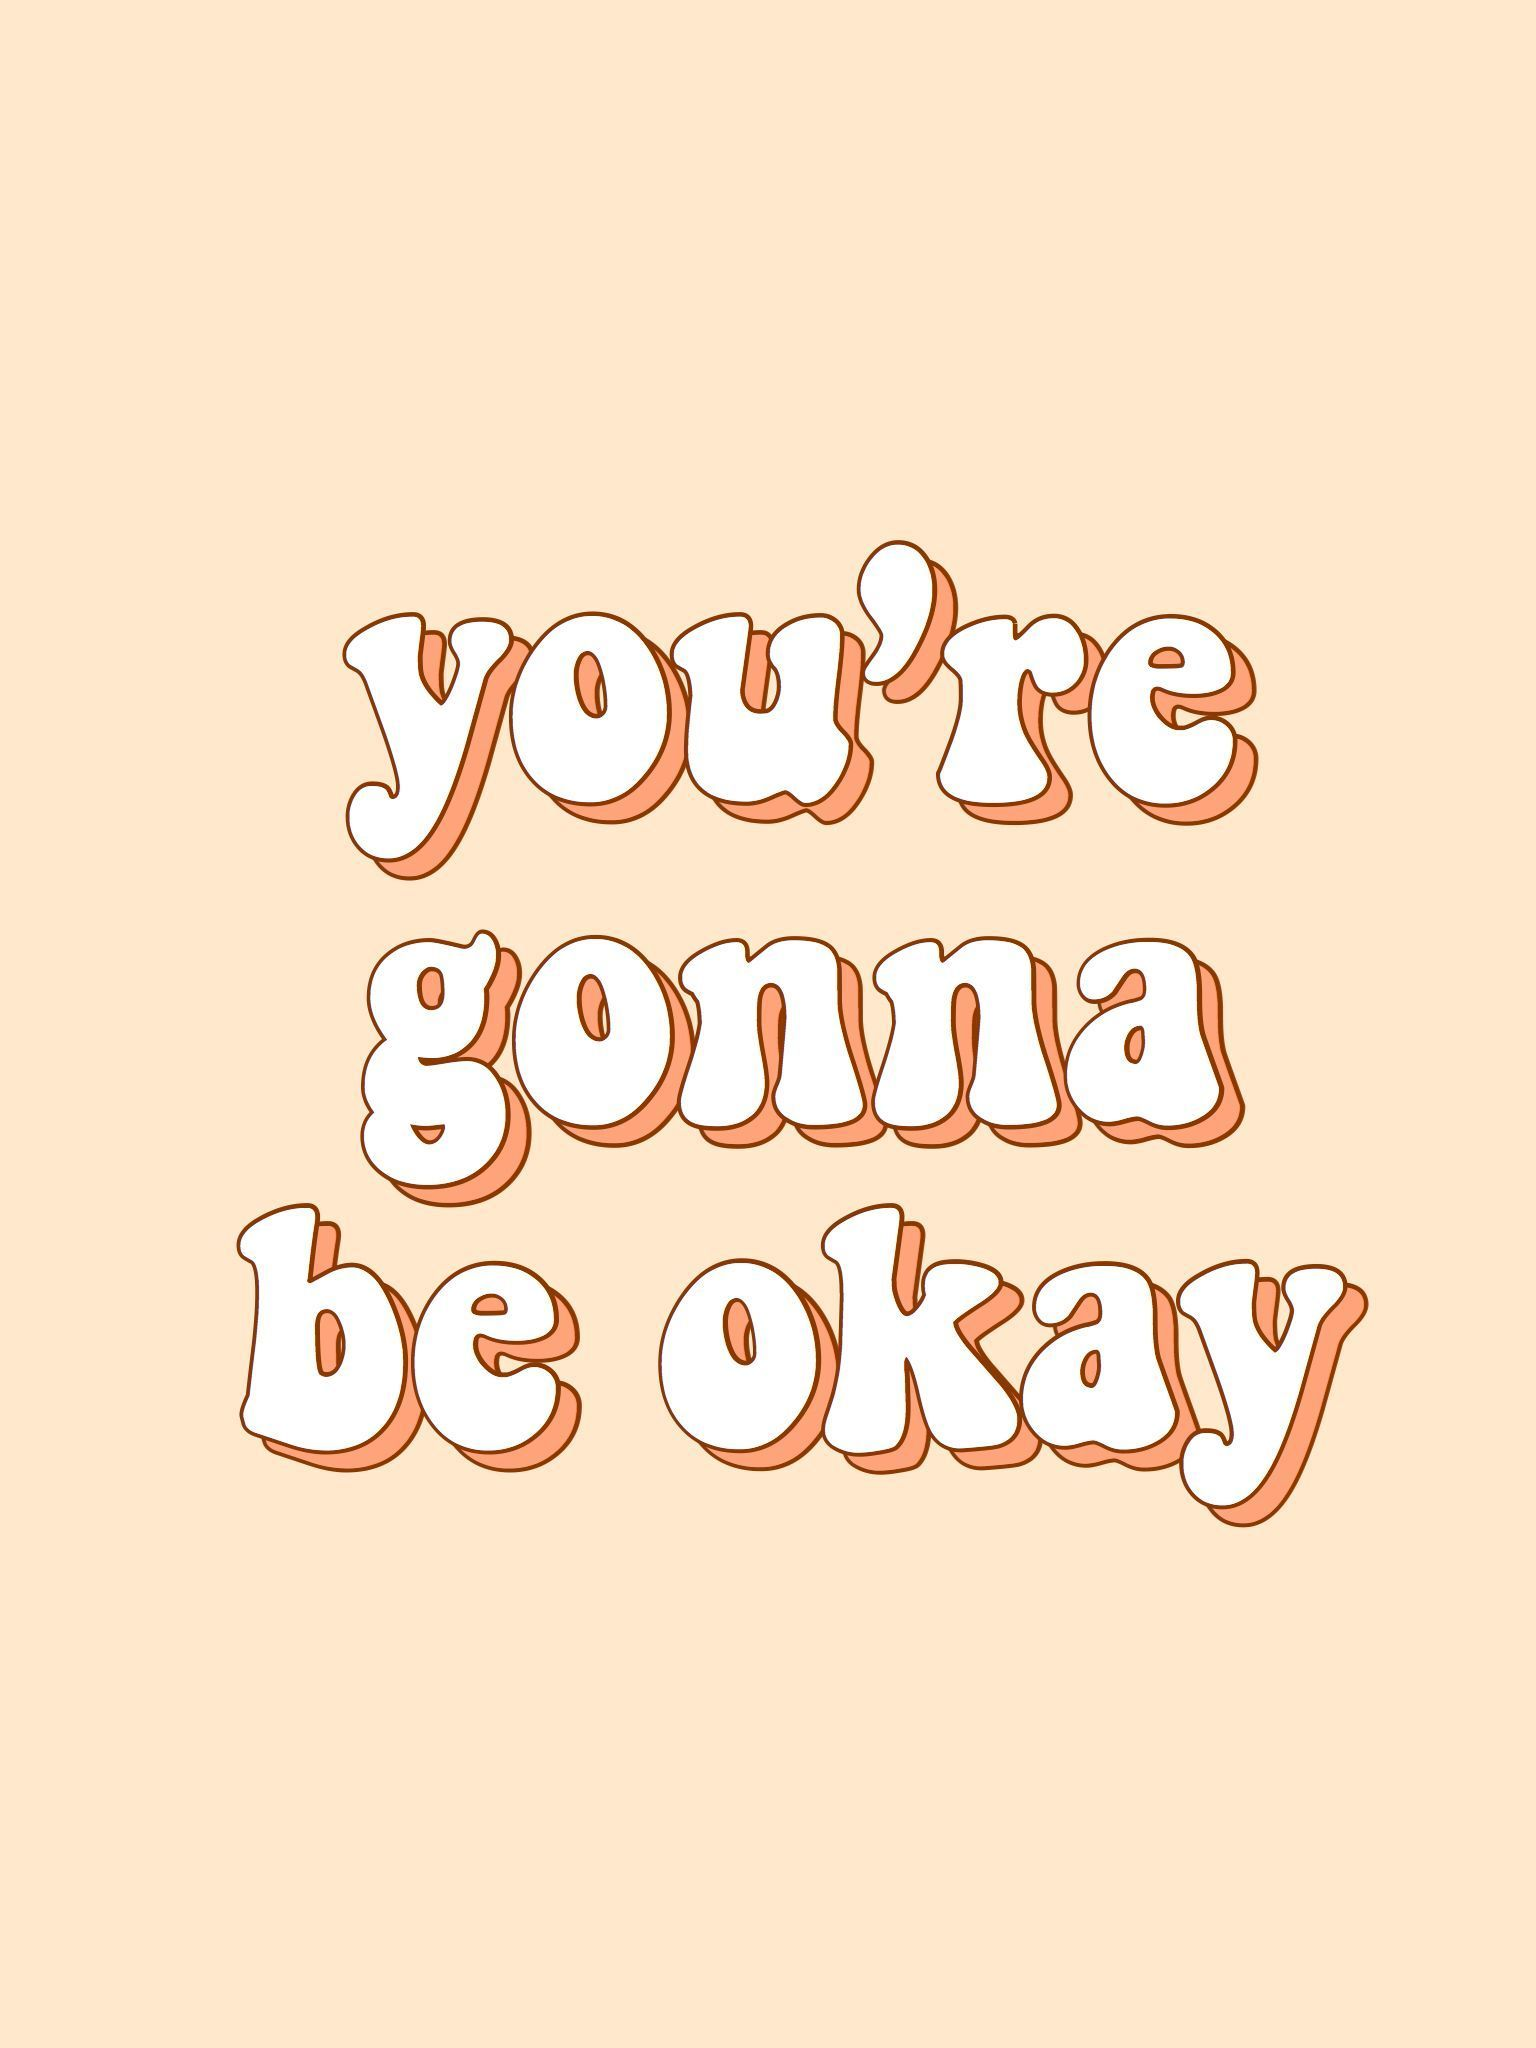 Background Pinterest Faithrice Aesthetic Motivate Inspire Orange Tumblr Youre Gonna Quote Words R Retro Quotes Orange Quotes Happy Words